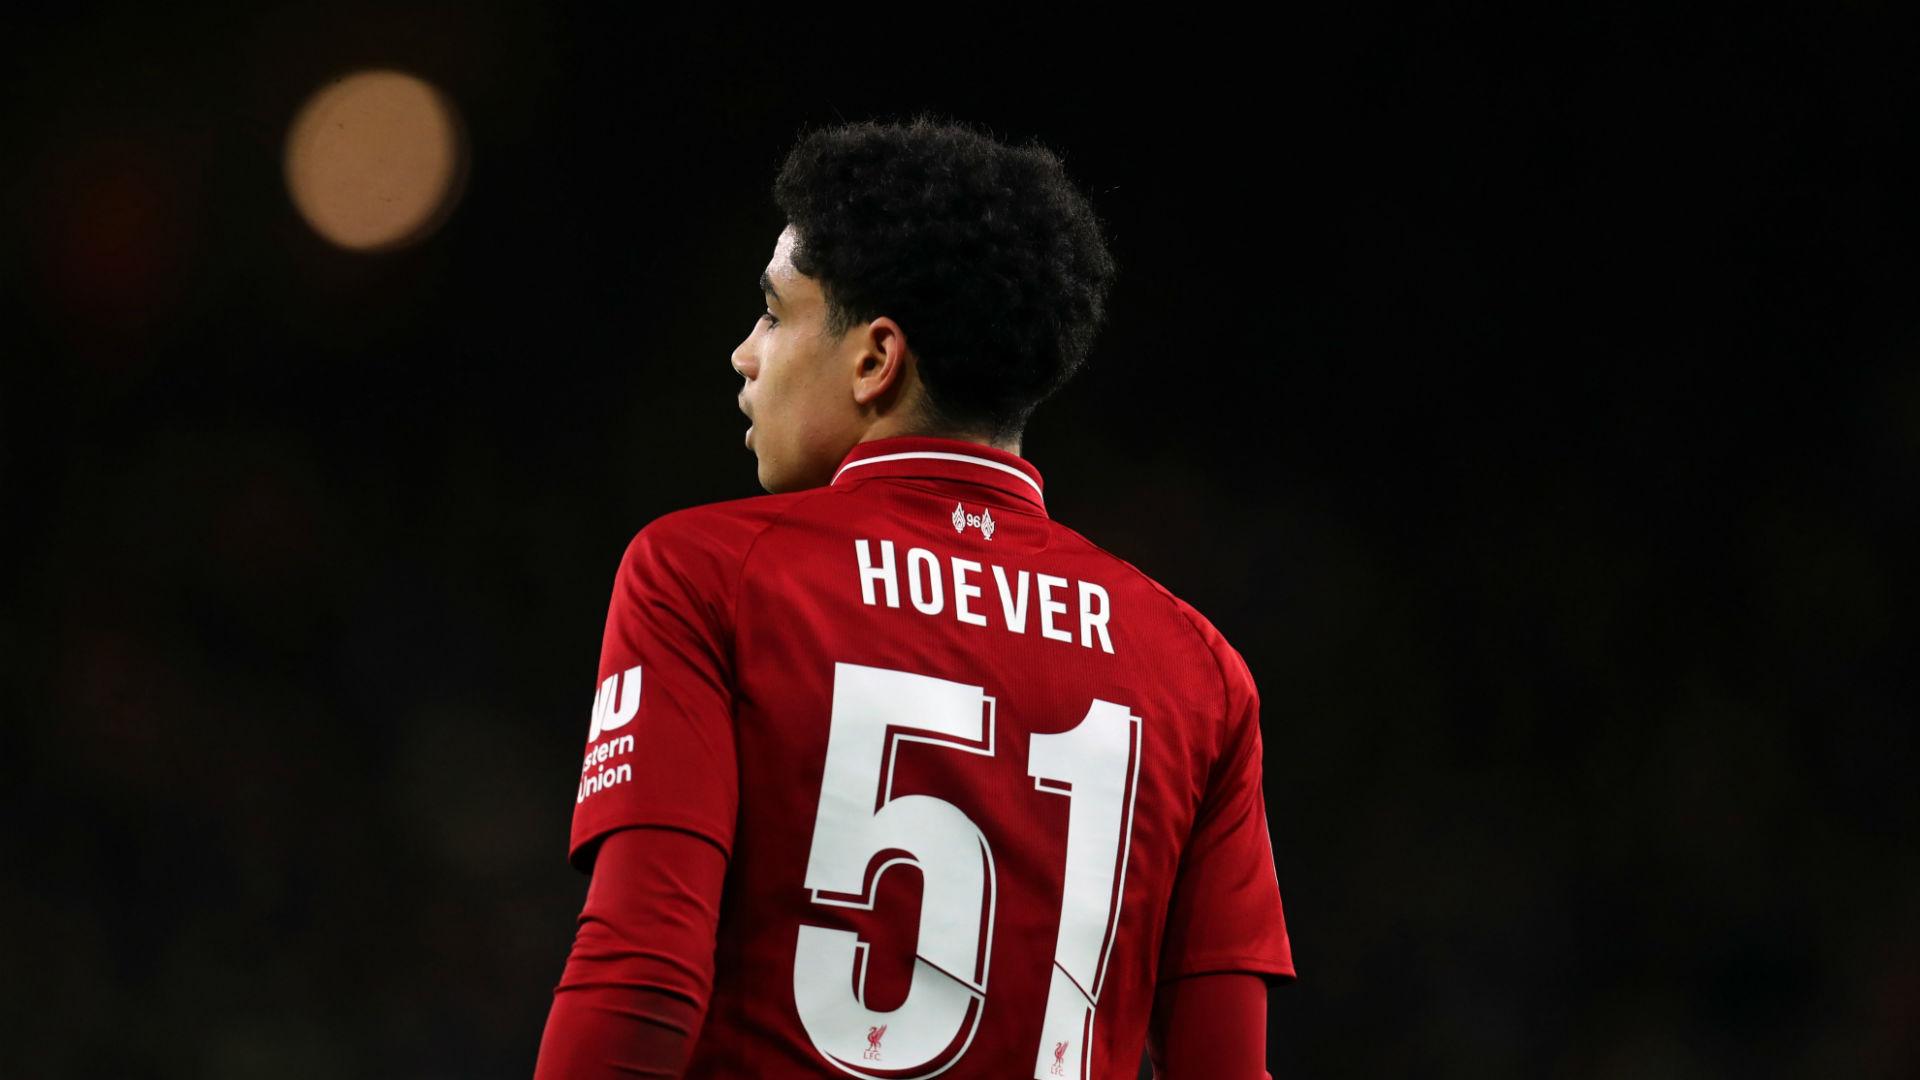 Ki-Jana Hoever Liverpool 2018/19